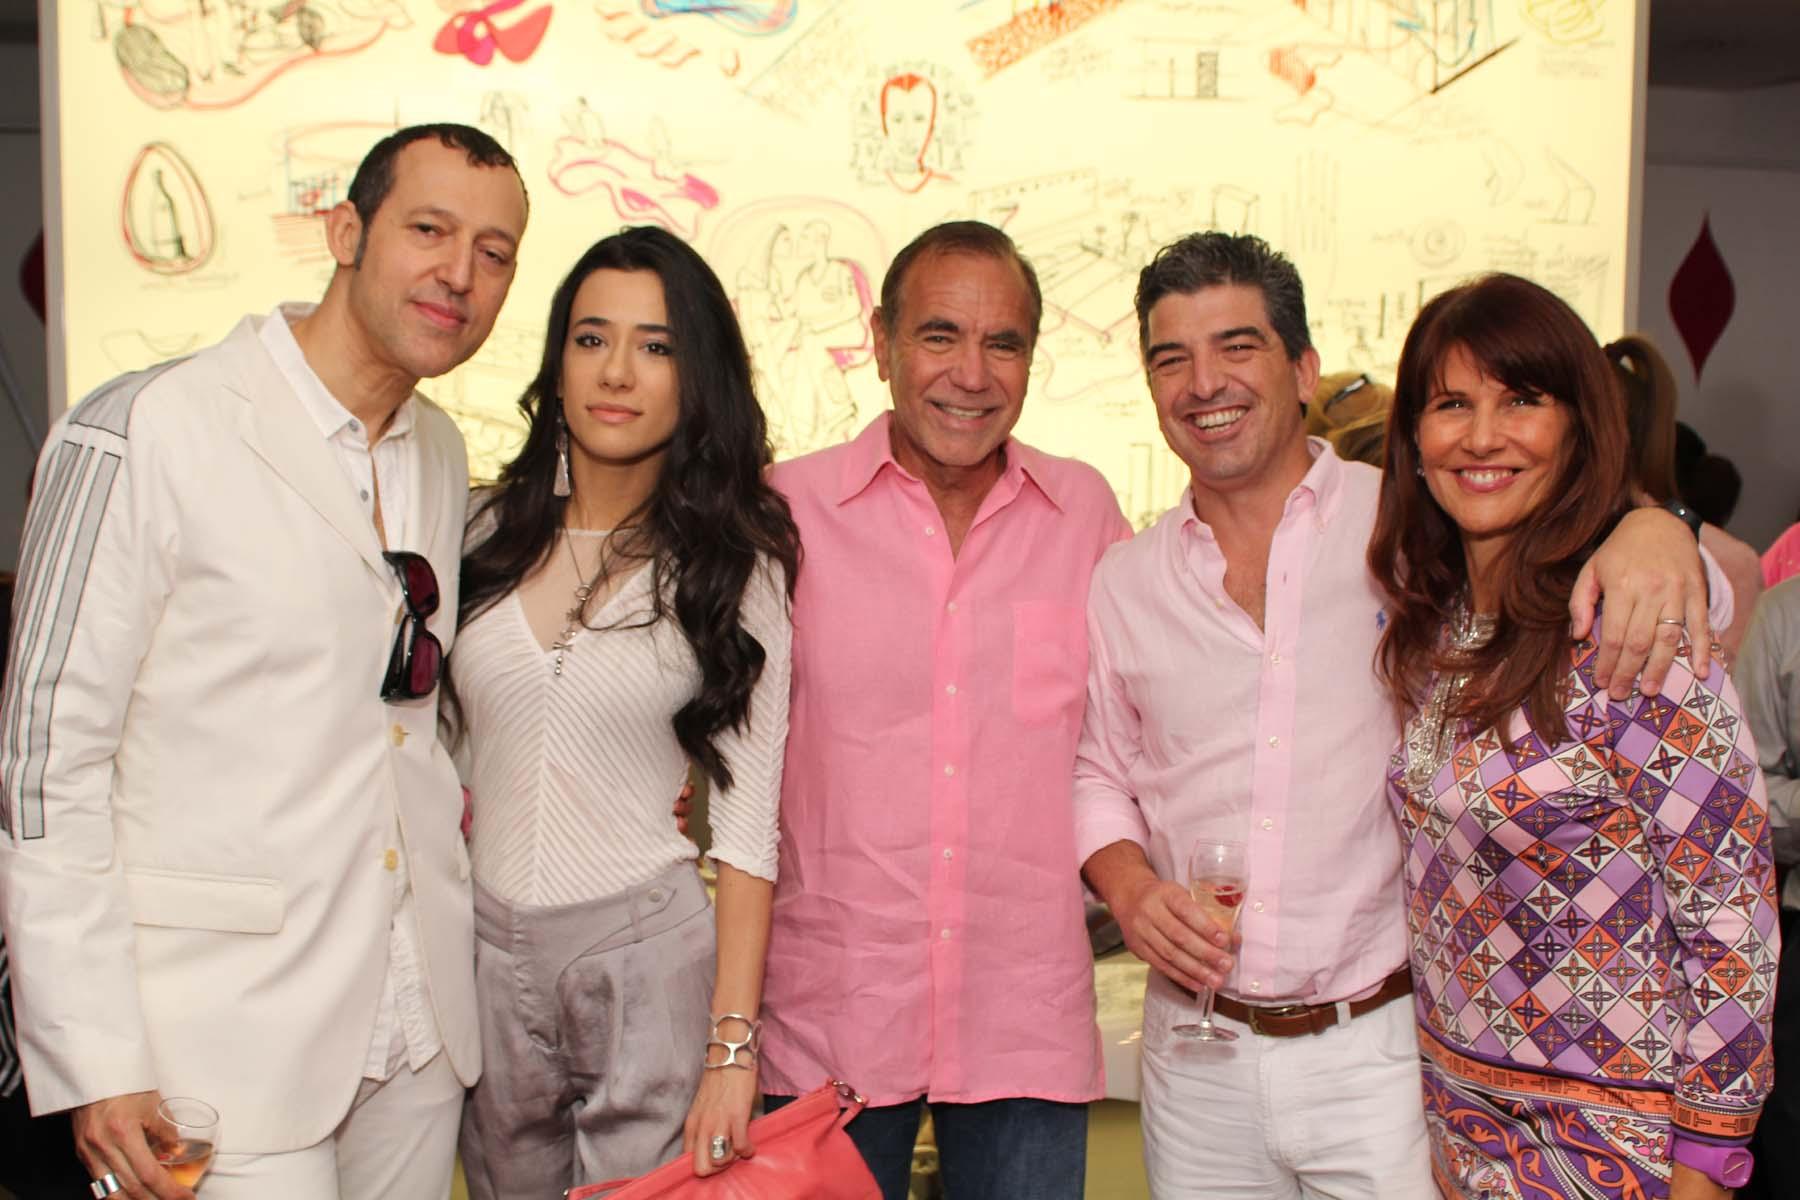 Karim Rashid, Ivana Puric, Jorge Perez, Carlos Rosso, Sonia Figueroa